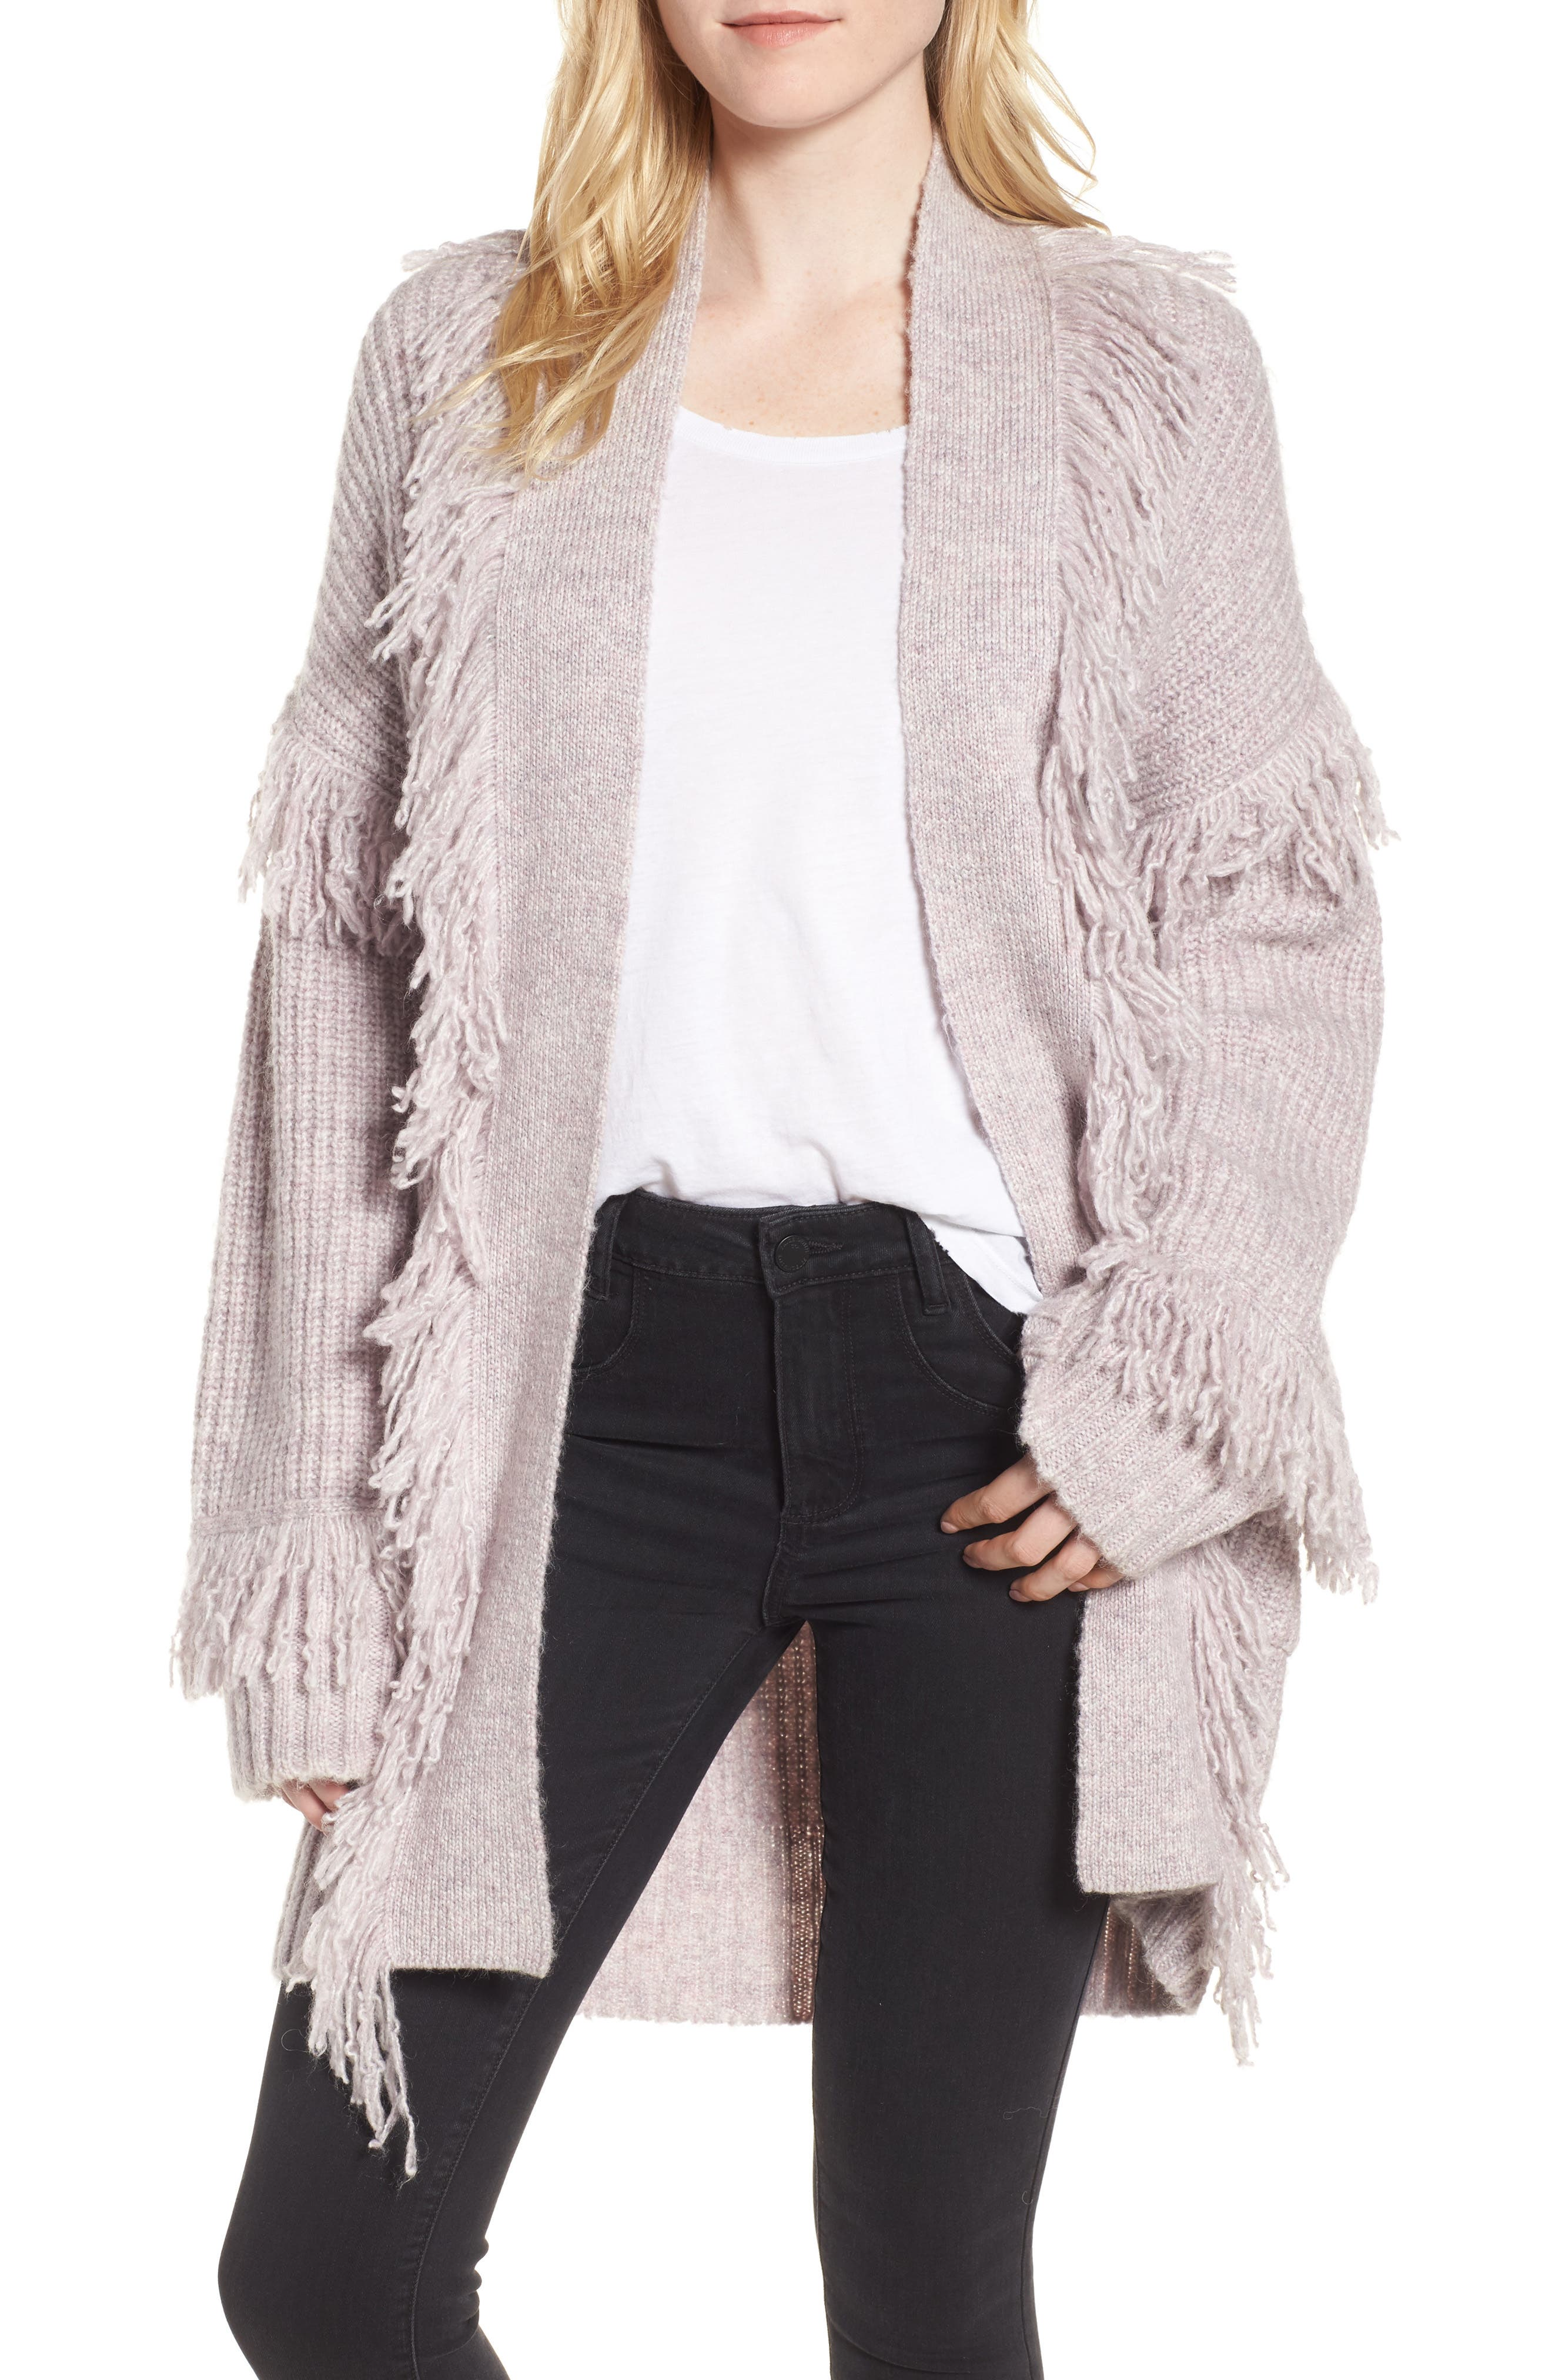 Berea Fringe Cardigan Sweater,                         Main,                         color, 684